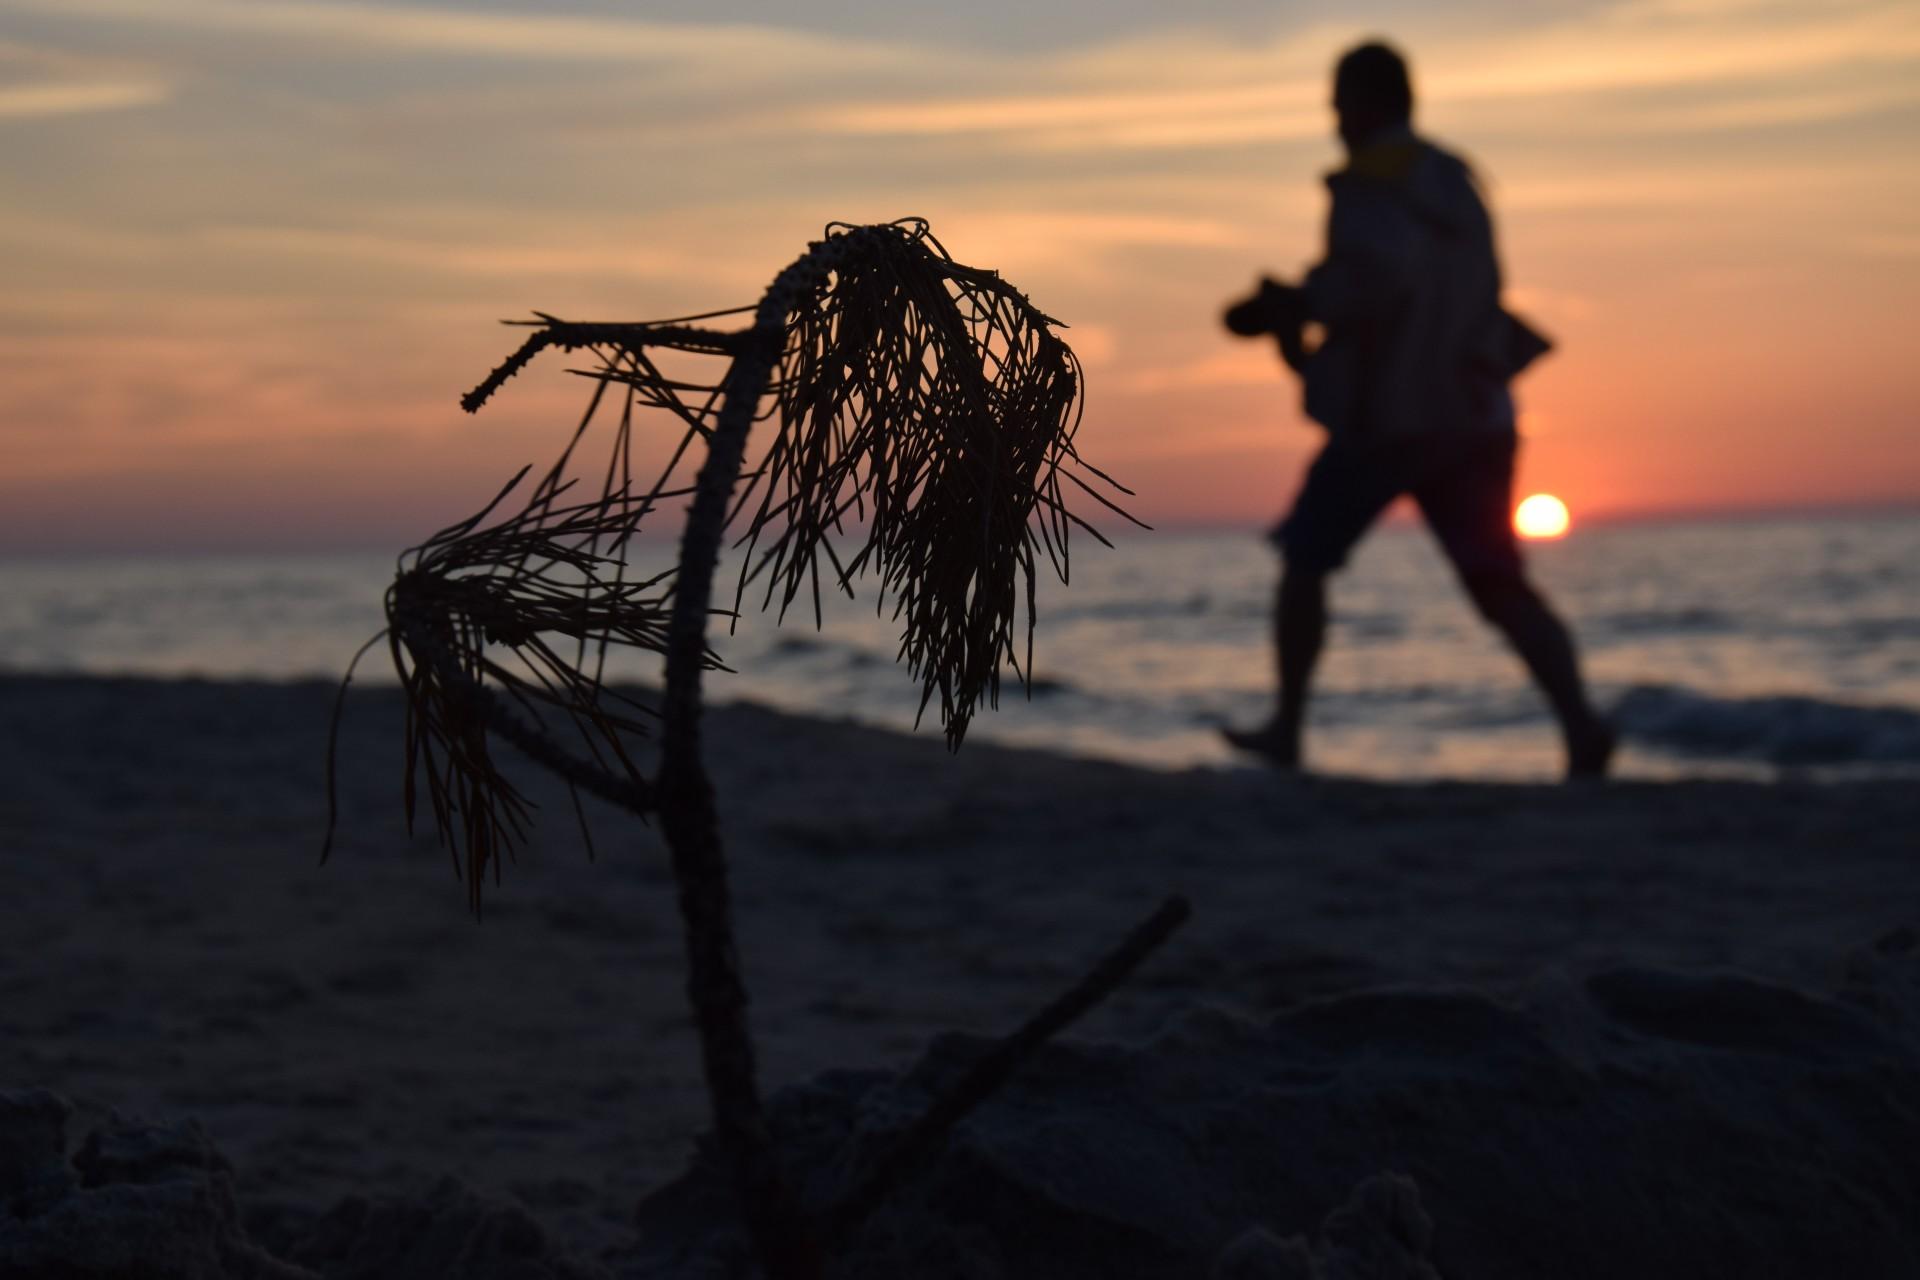 Kopalino, plaża. Nieopowiedziane historie [FOTOREPORTAŻ] 10